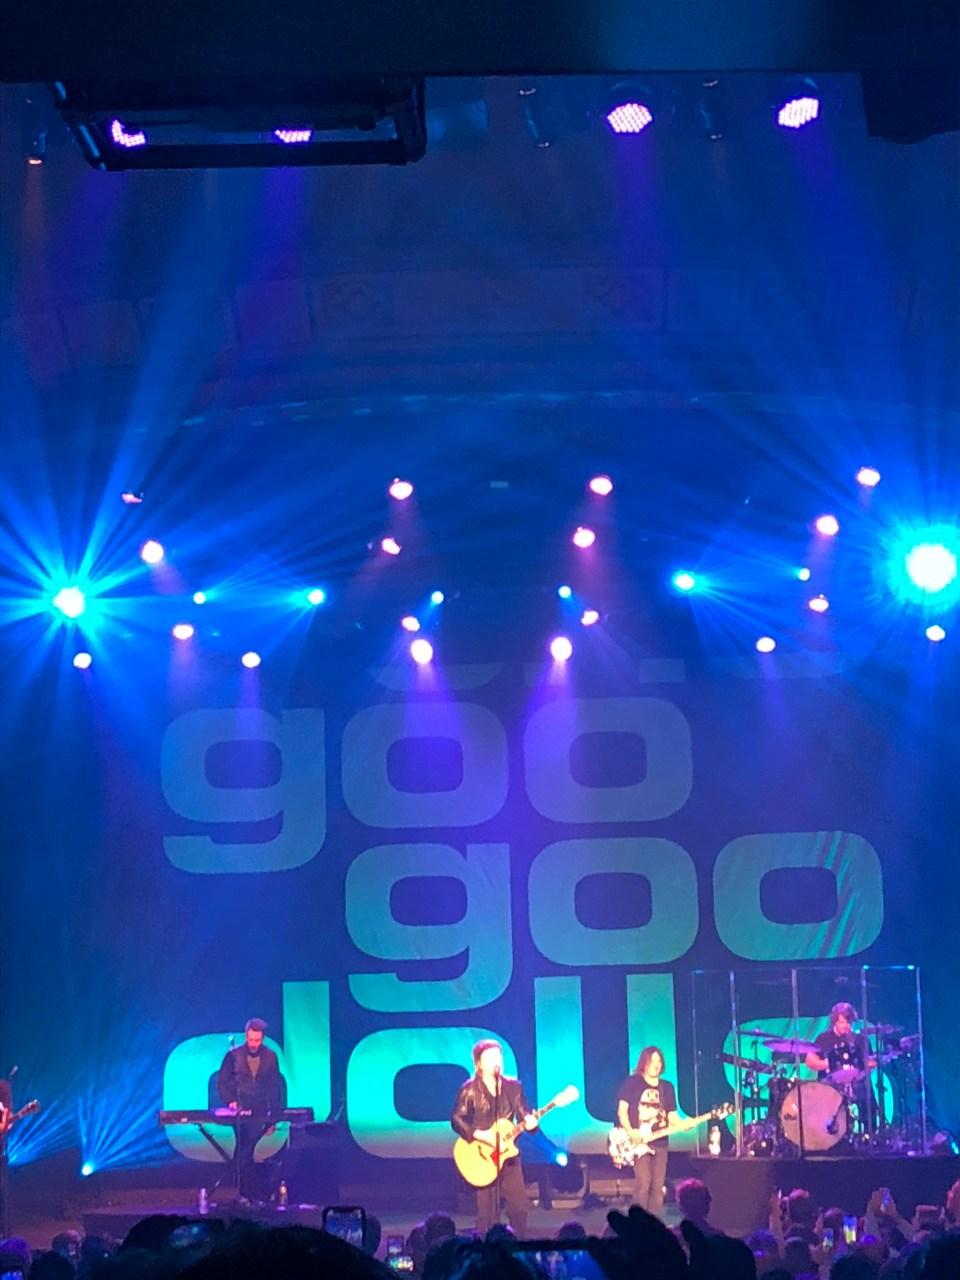 Goo Goo Dolls - Dizzy Up the Girl Anniversary 8